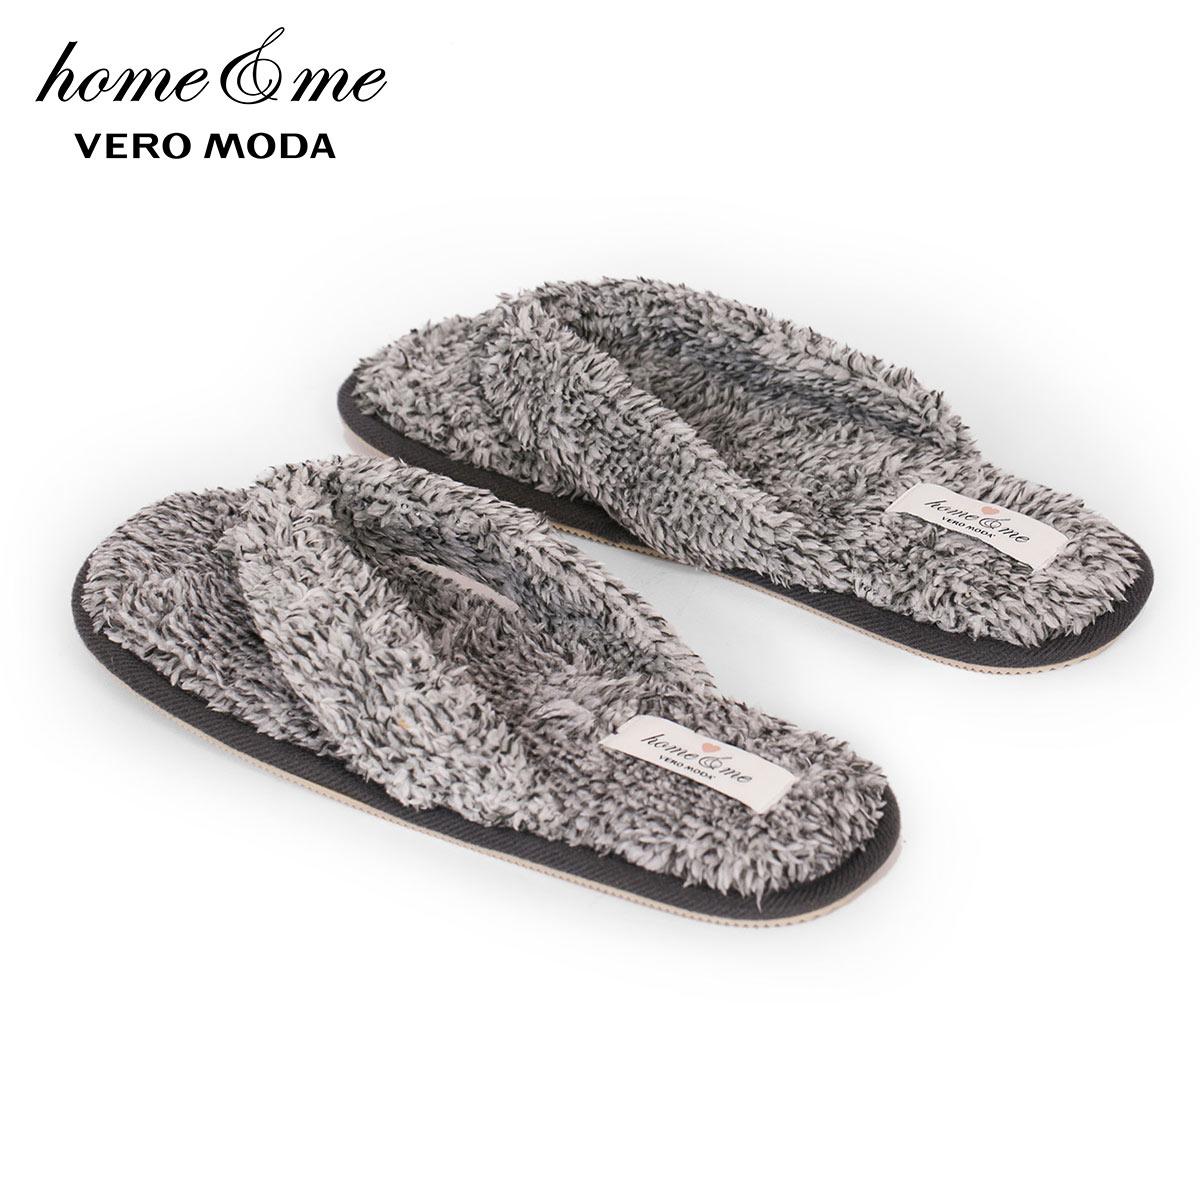 Vero Moda Women's Antiskid Downy Homewear Flip-Flops | 3183SA501